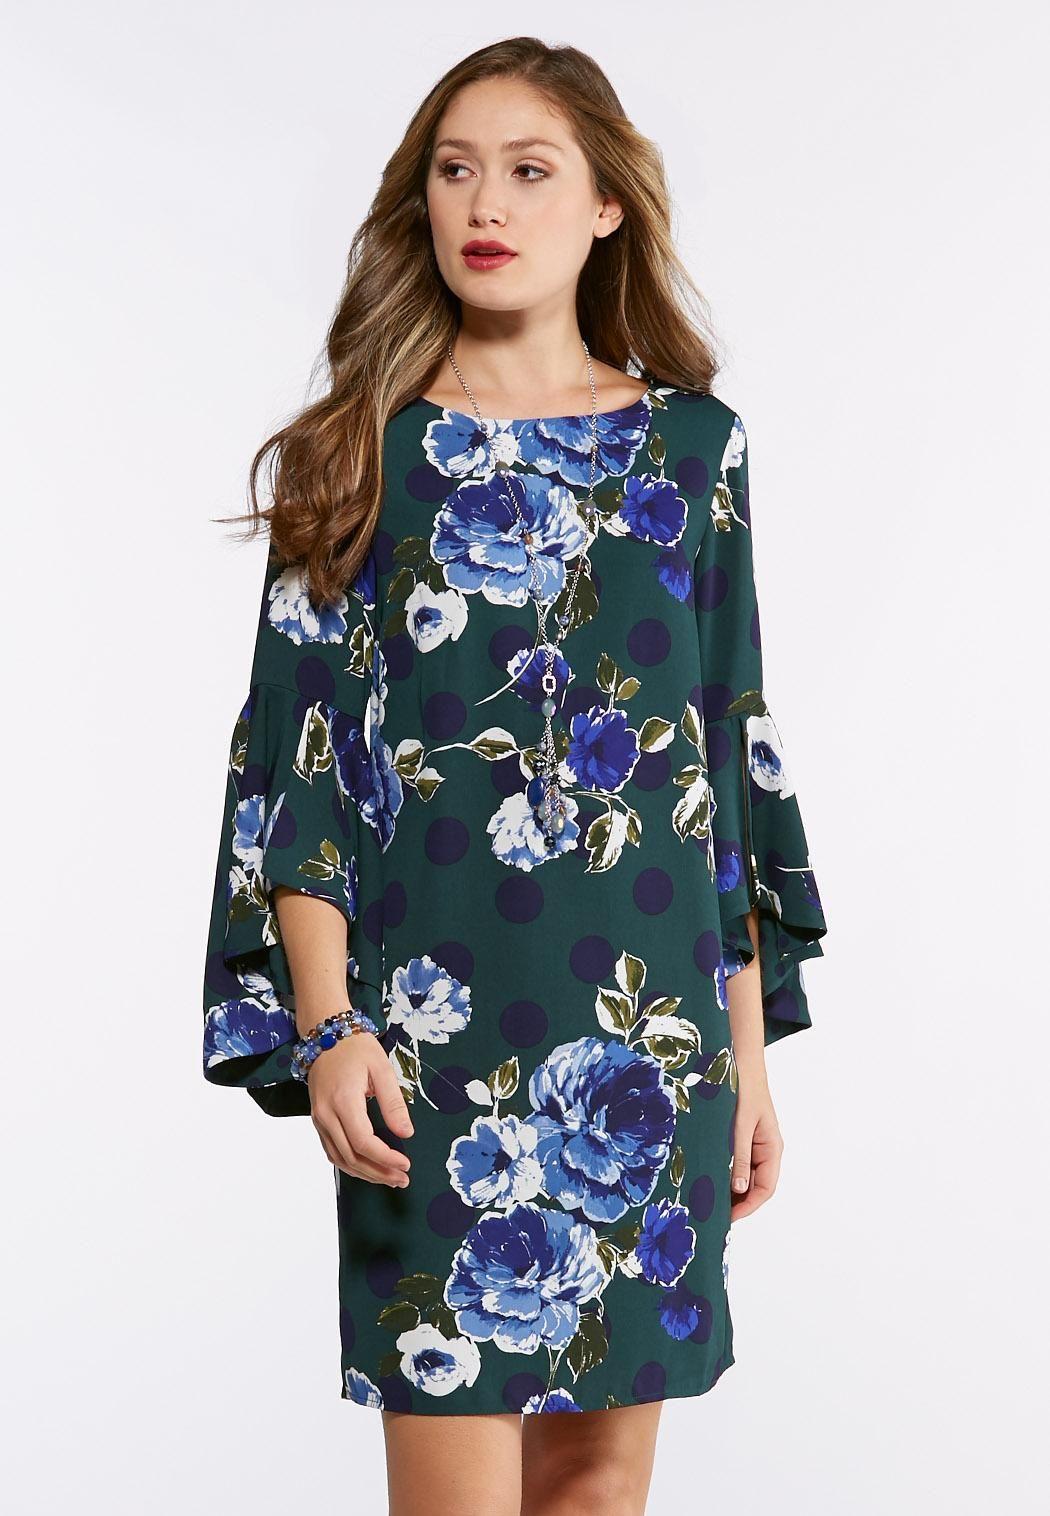 8b8503a73d4 Plus Size Split Bell Sleeve Floral Dot Dress Plus Sizes Cato Fashions